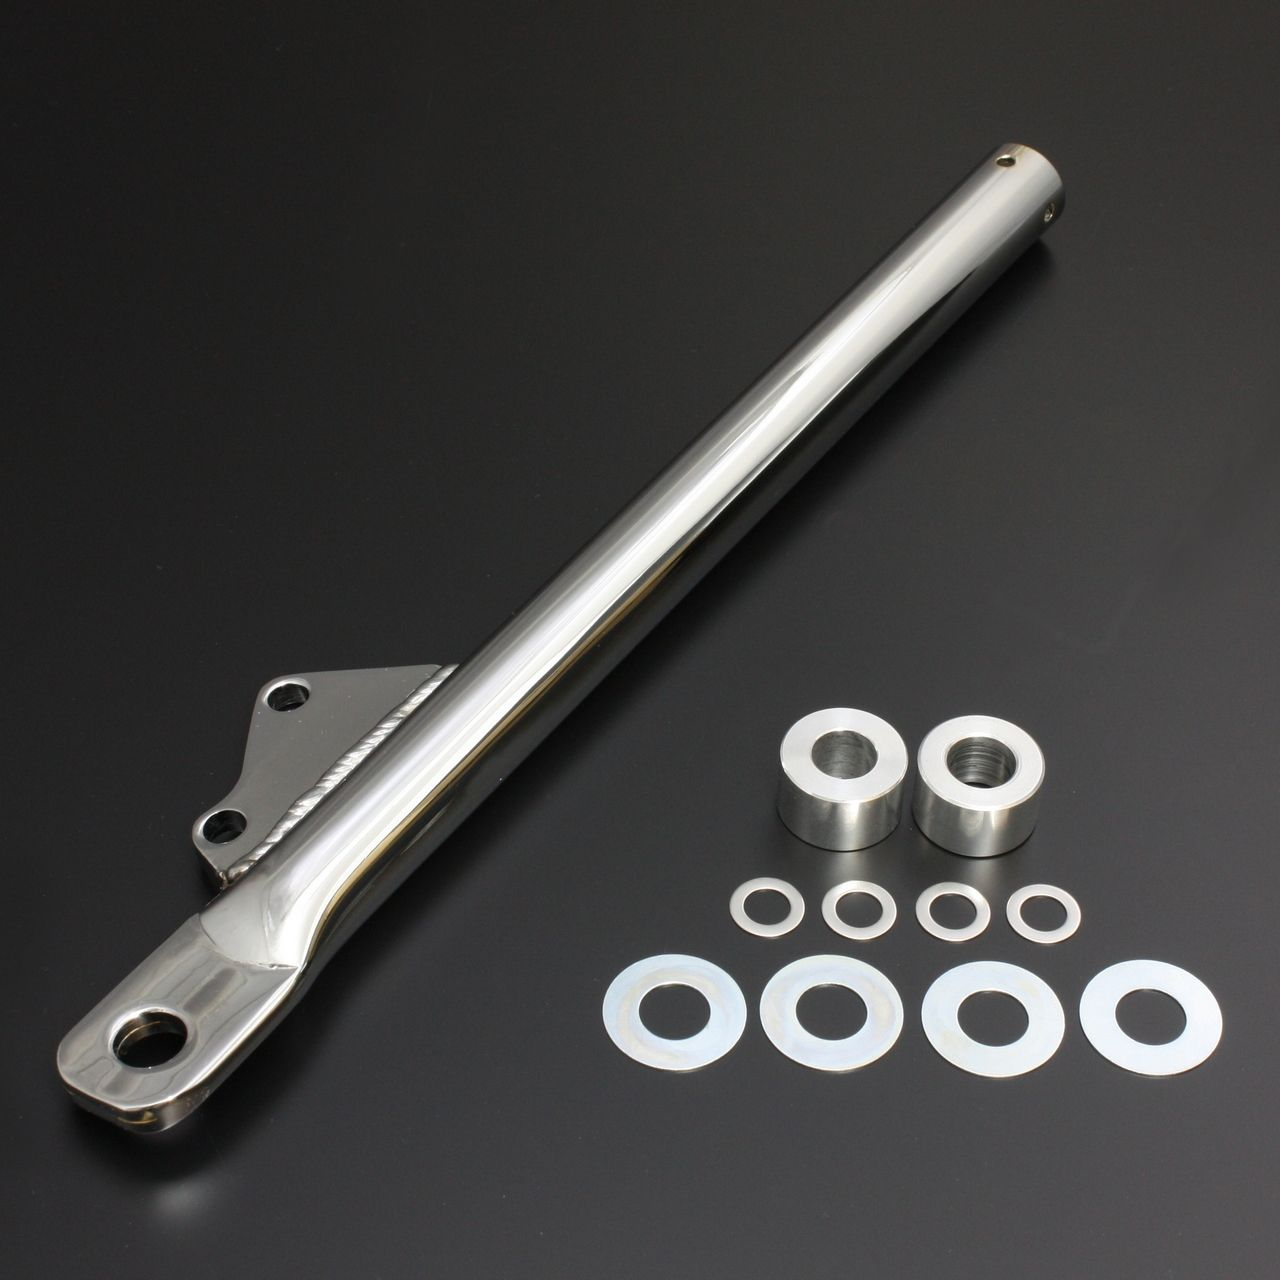 【G-Craft】前叉內管 (KTM卡鉗專用) - 「Webike-摩托百貨」